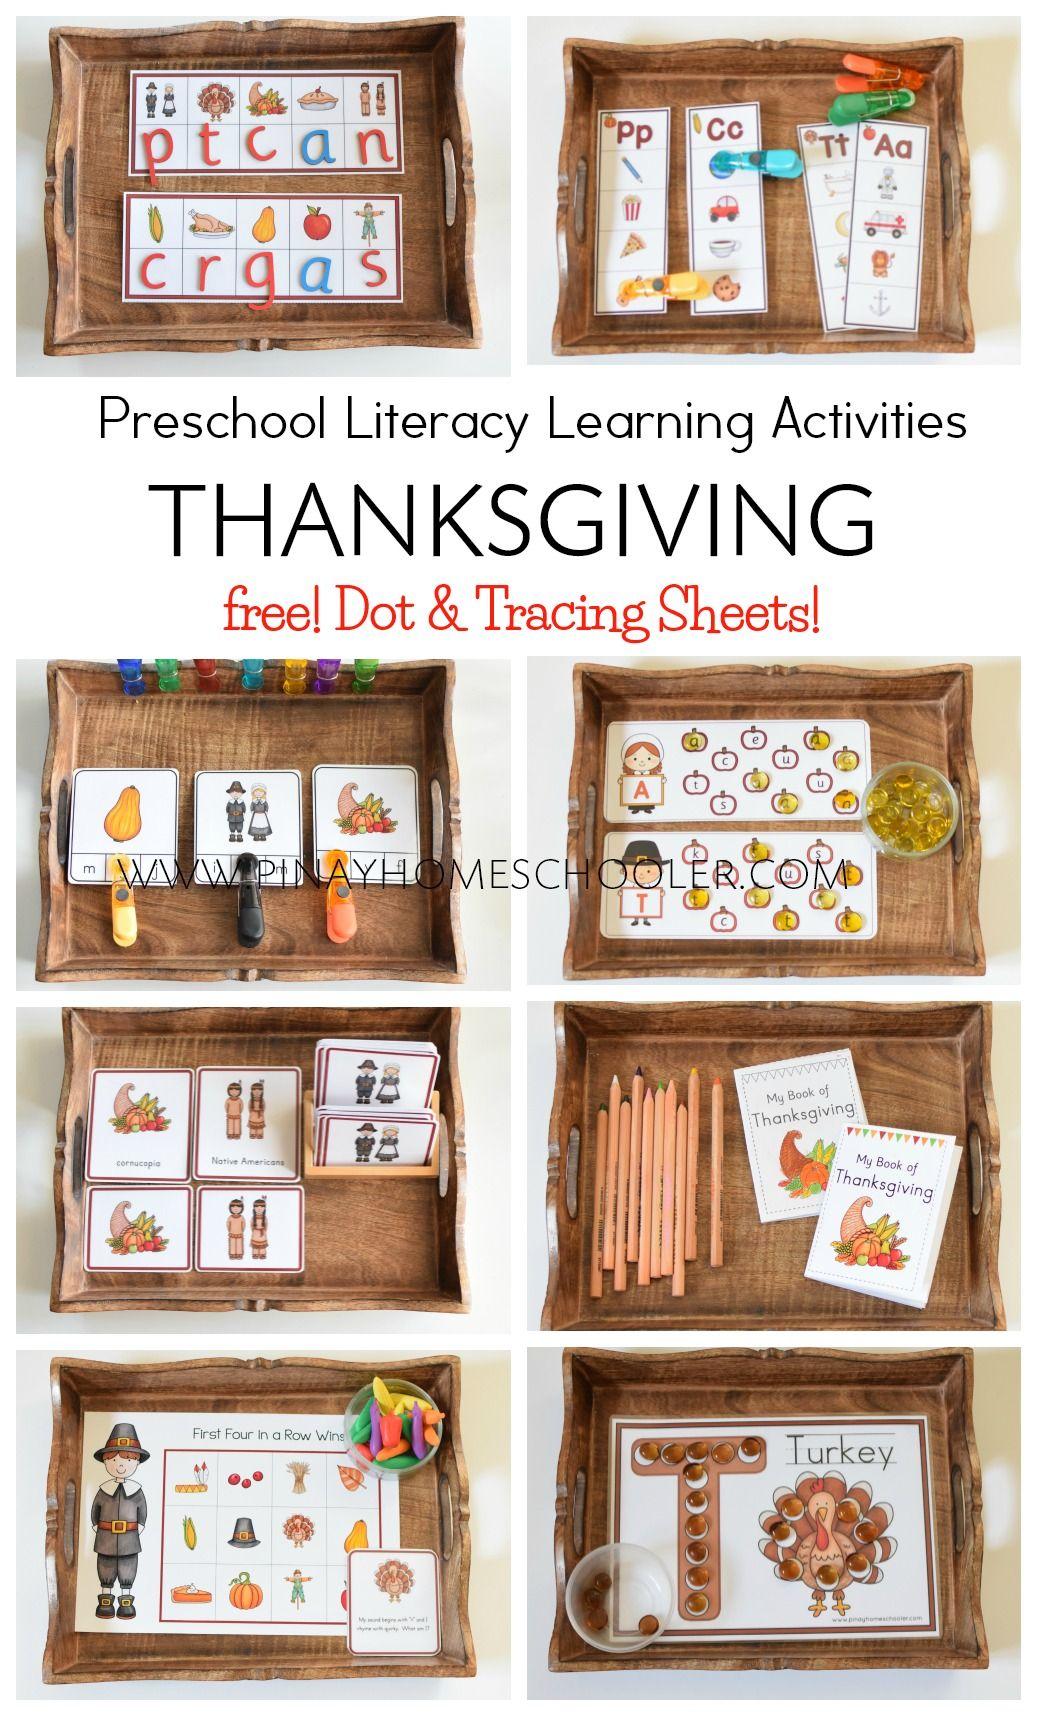 Thanksgiving Preschool Literacy Learning Pack